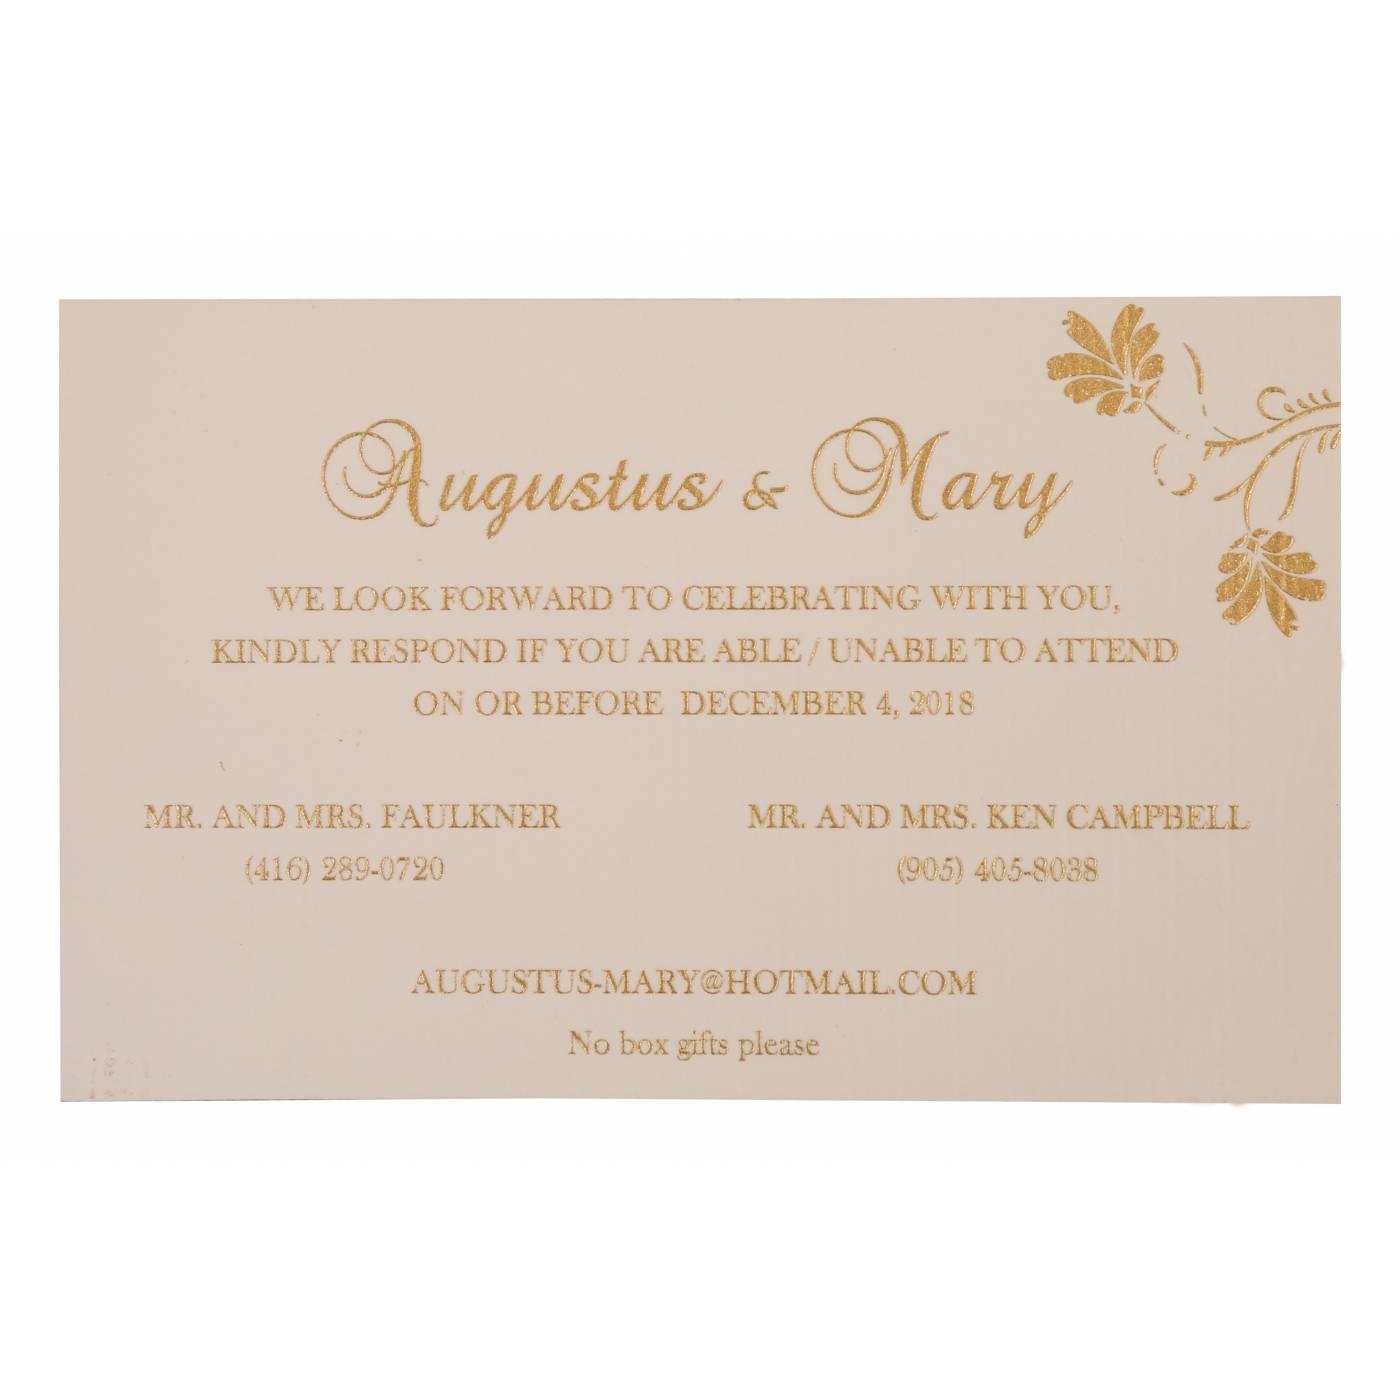 BEIGE SHIMMERY SCREEN PRINTED WEDDING INVITATION : CG-803E - IndianWeddingCards